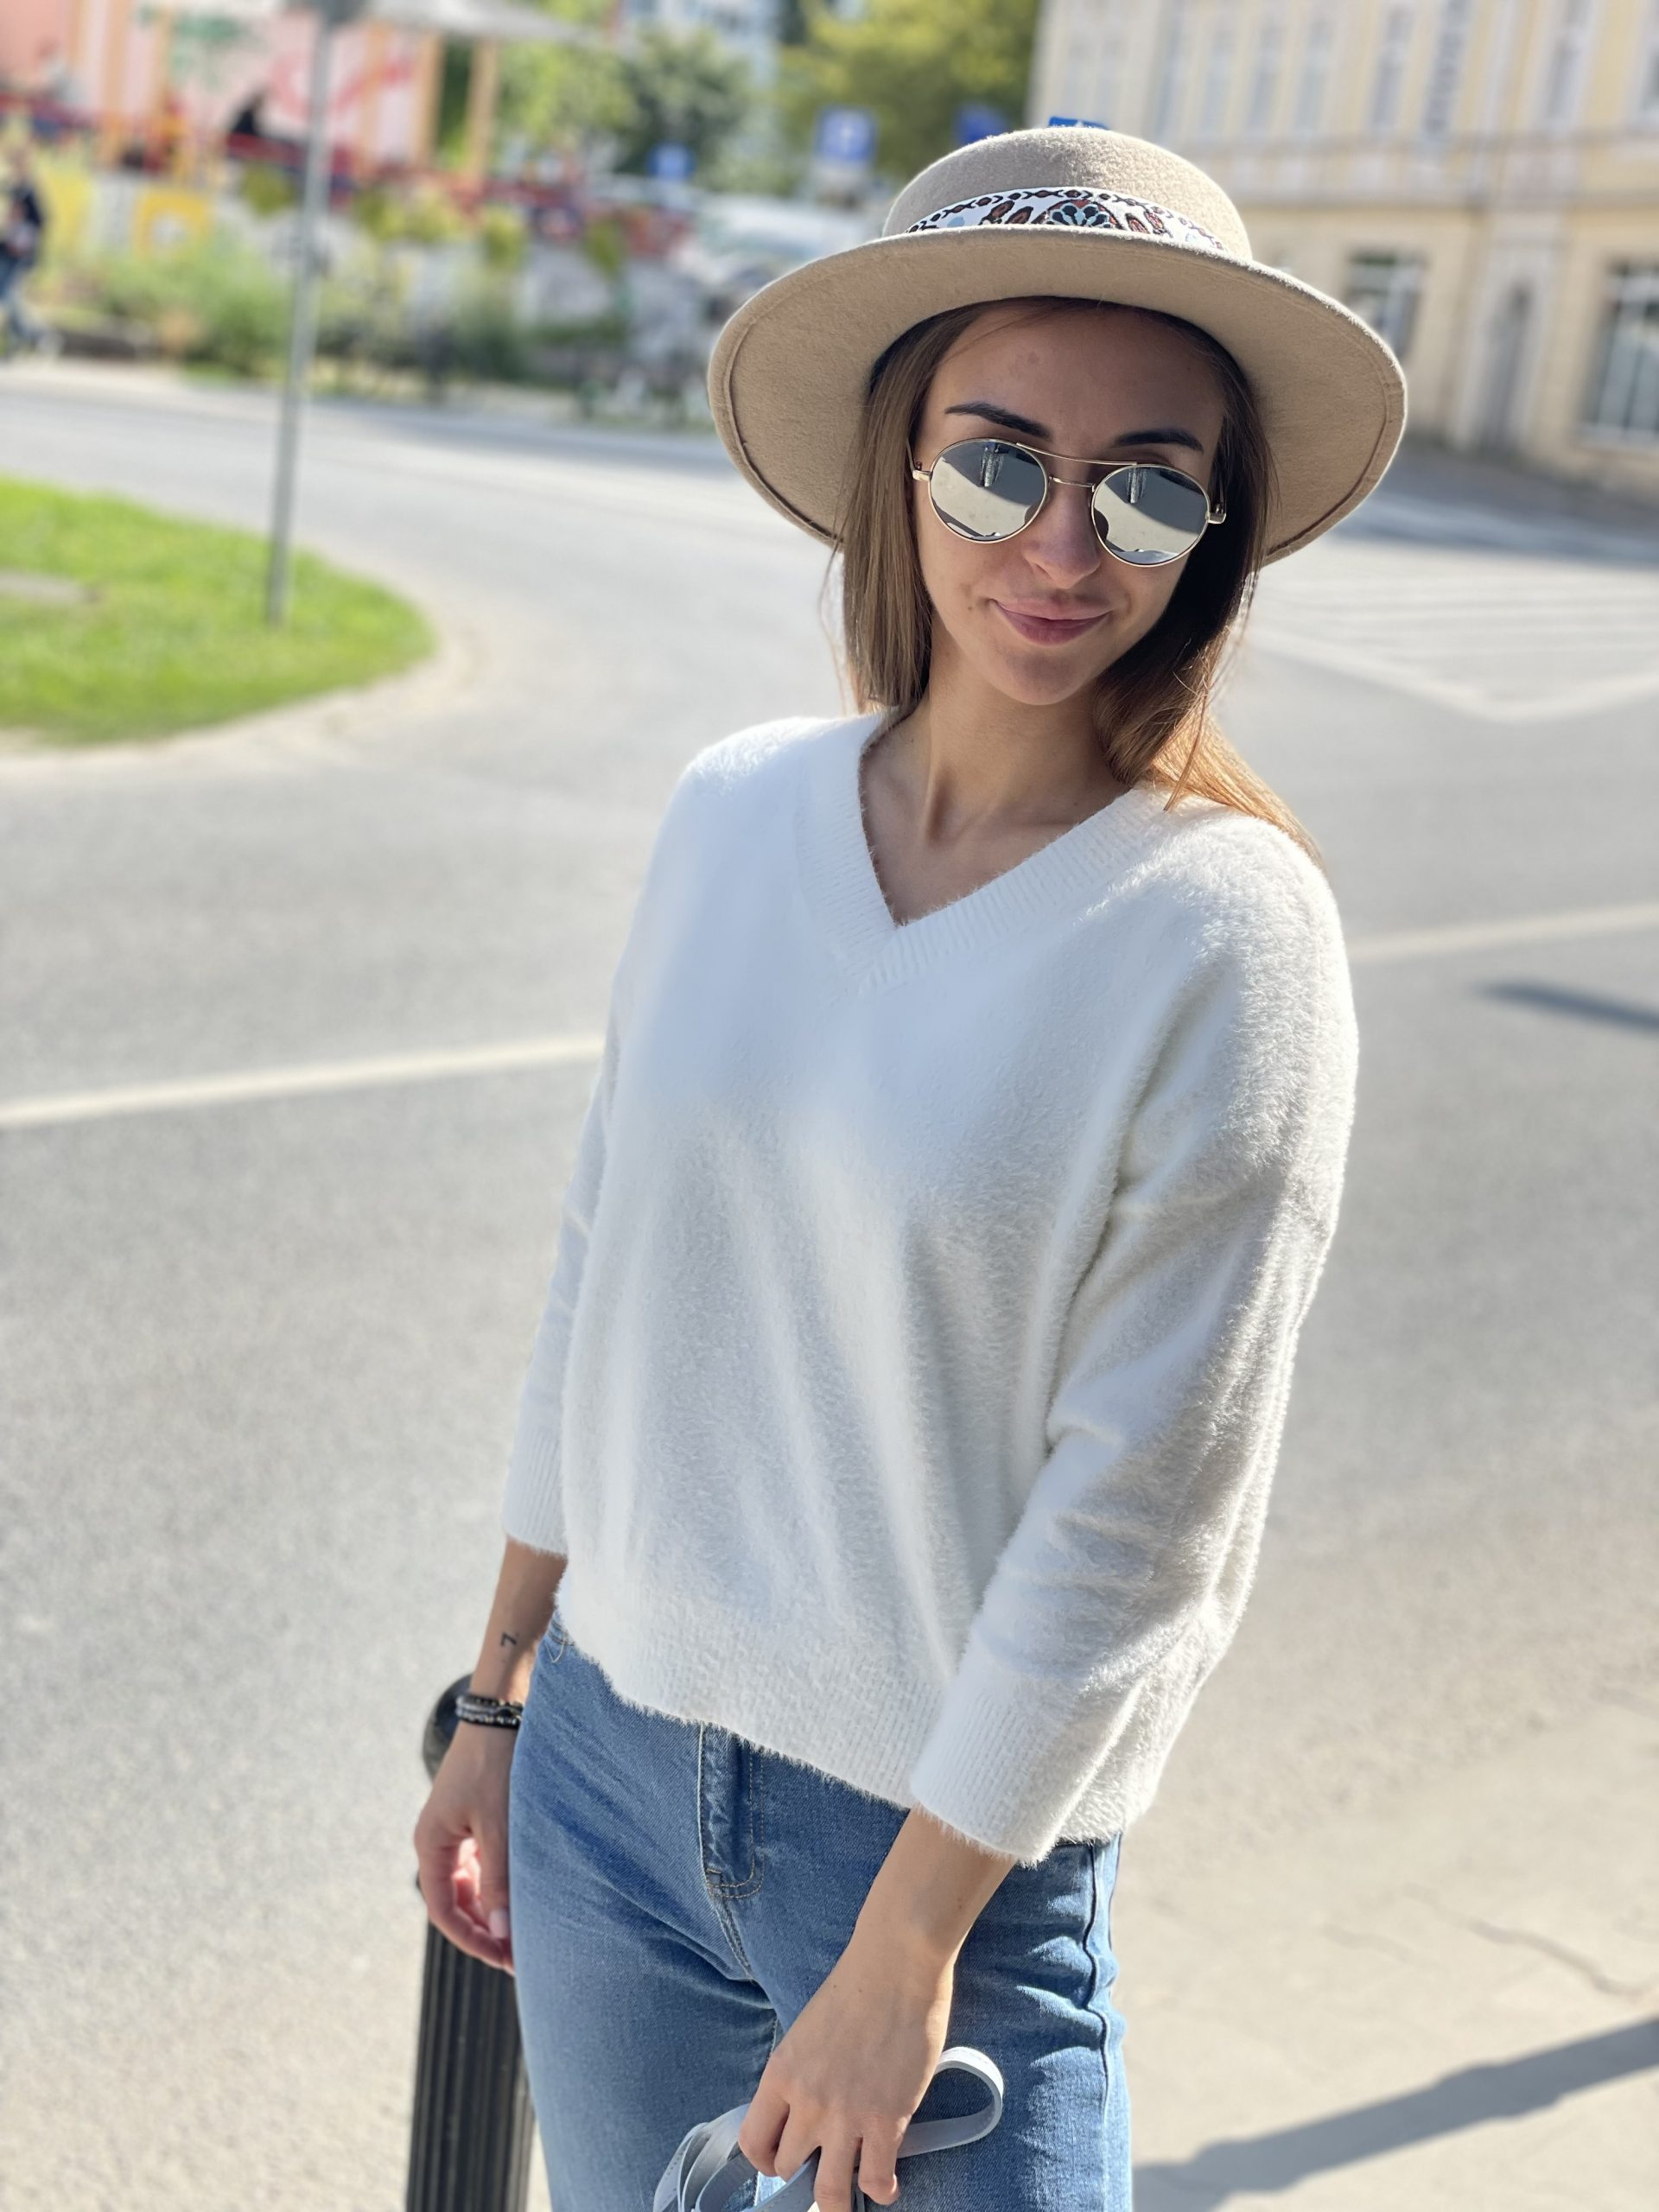 Sweterek Vka short * śmietanka